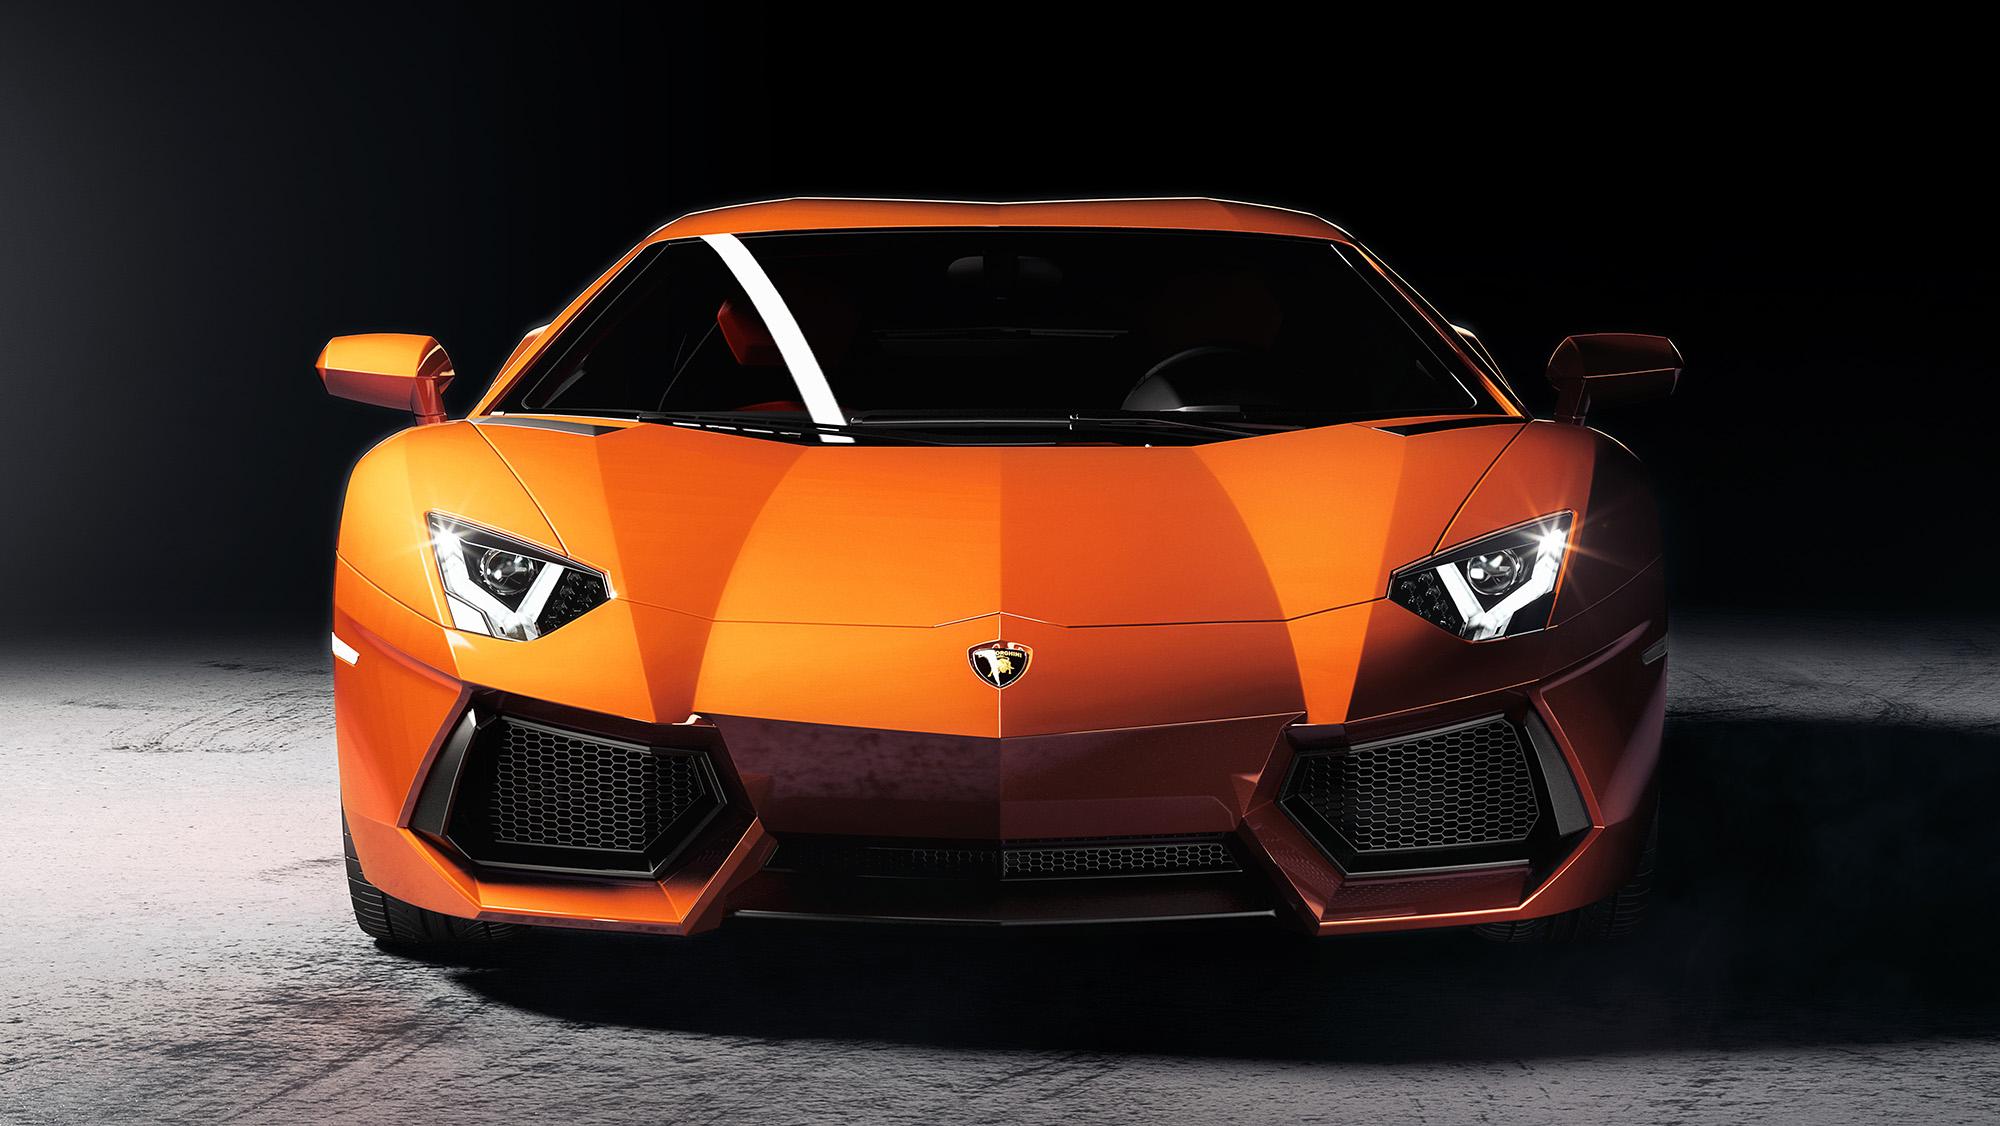 Lamborghini_front_01_w5_LOWREZ.jpg